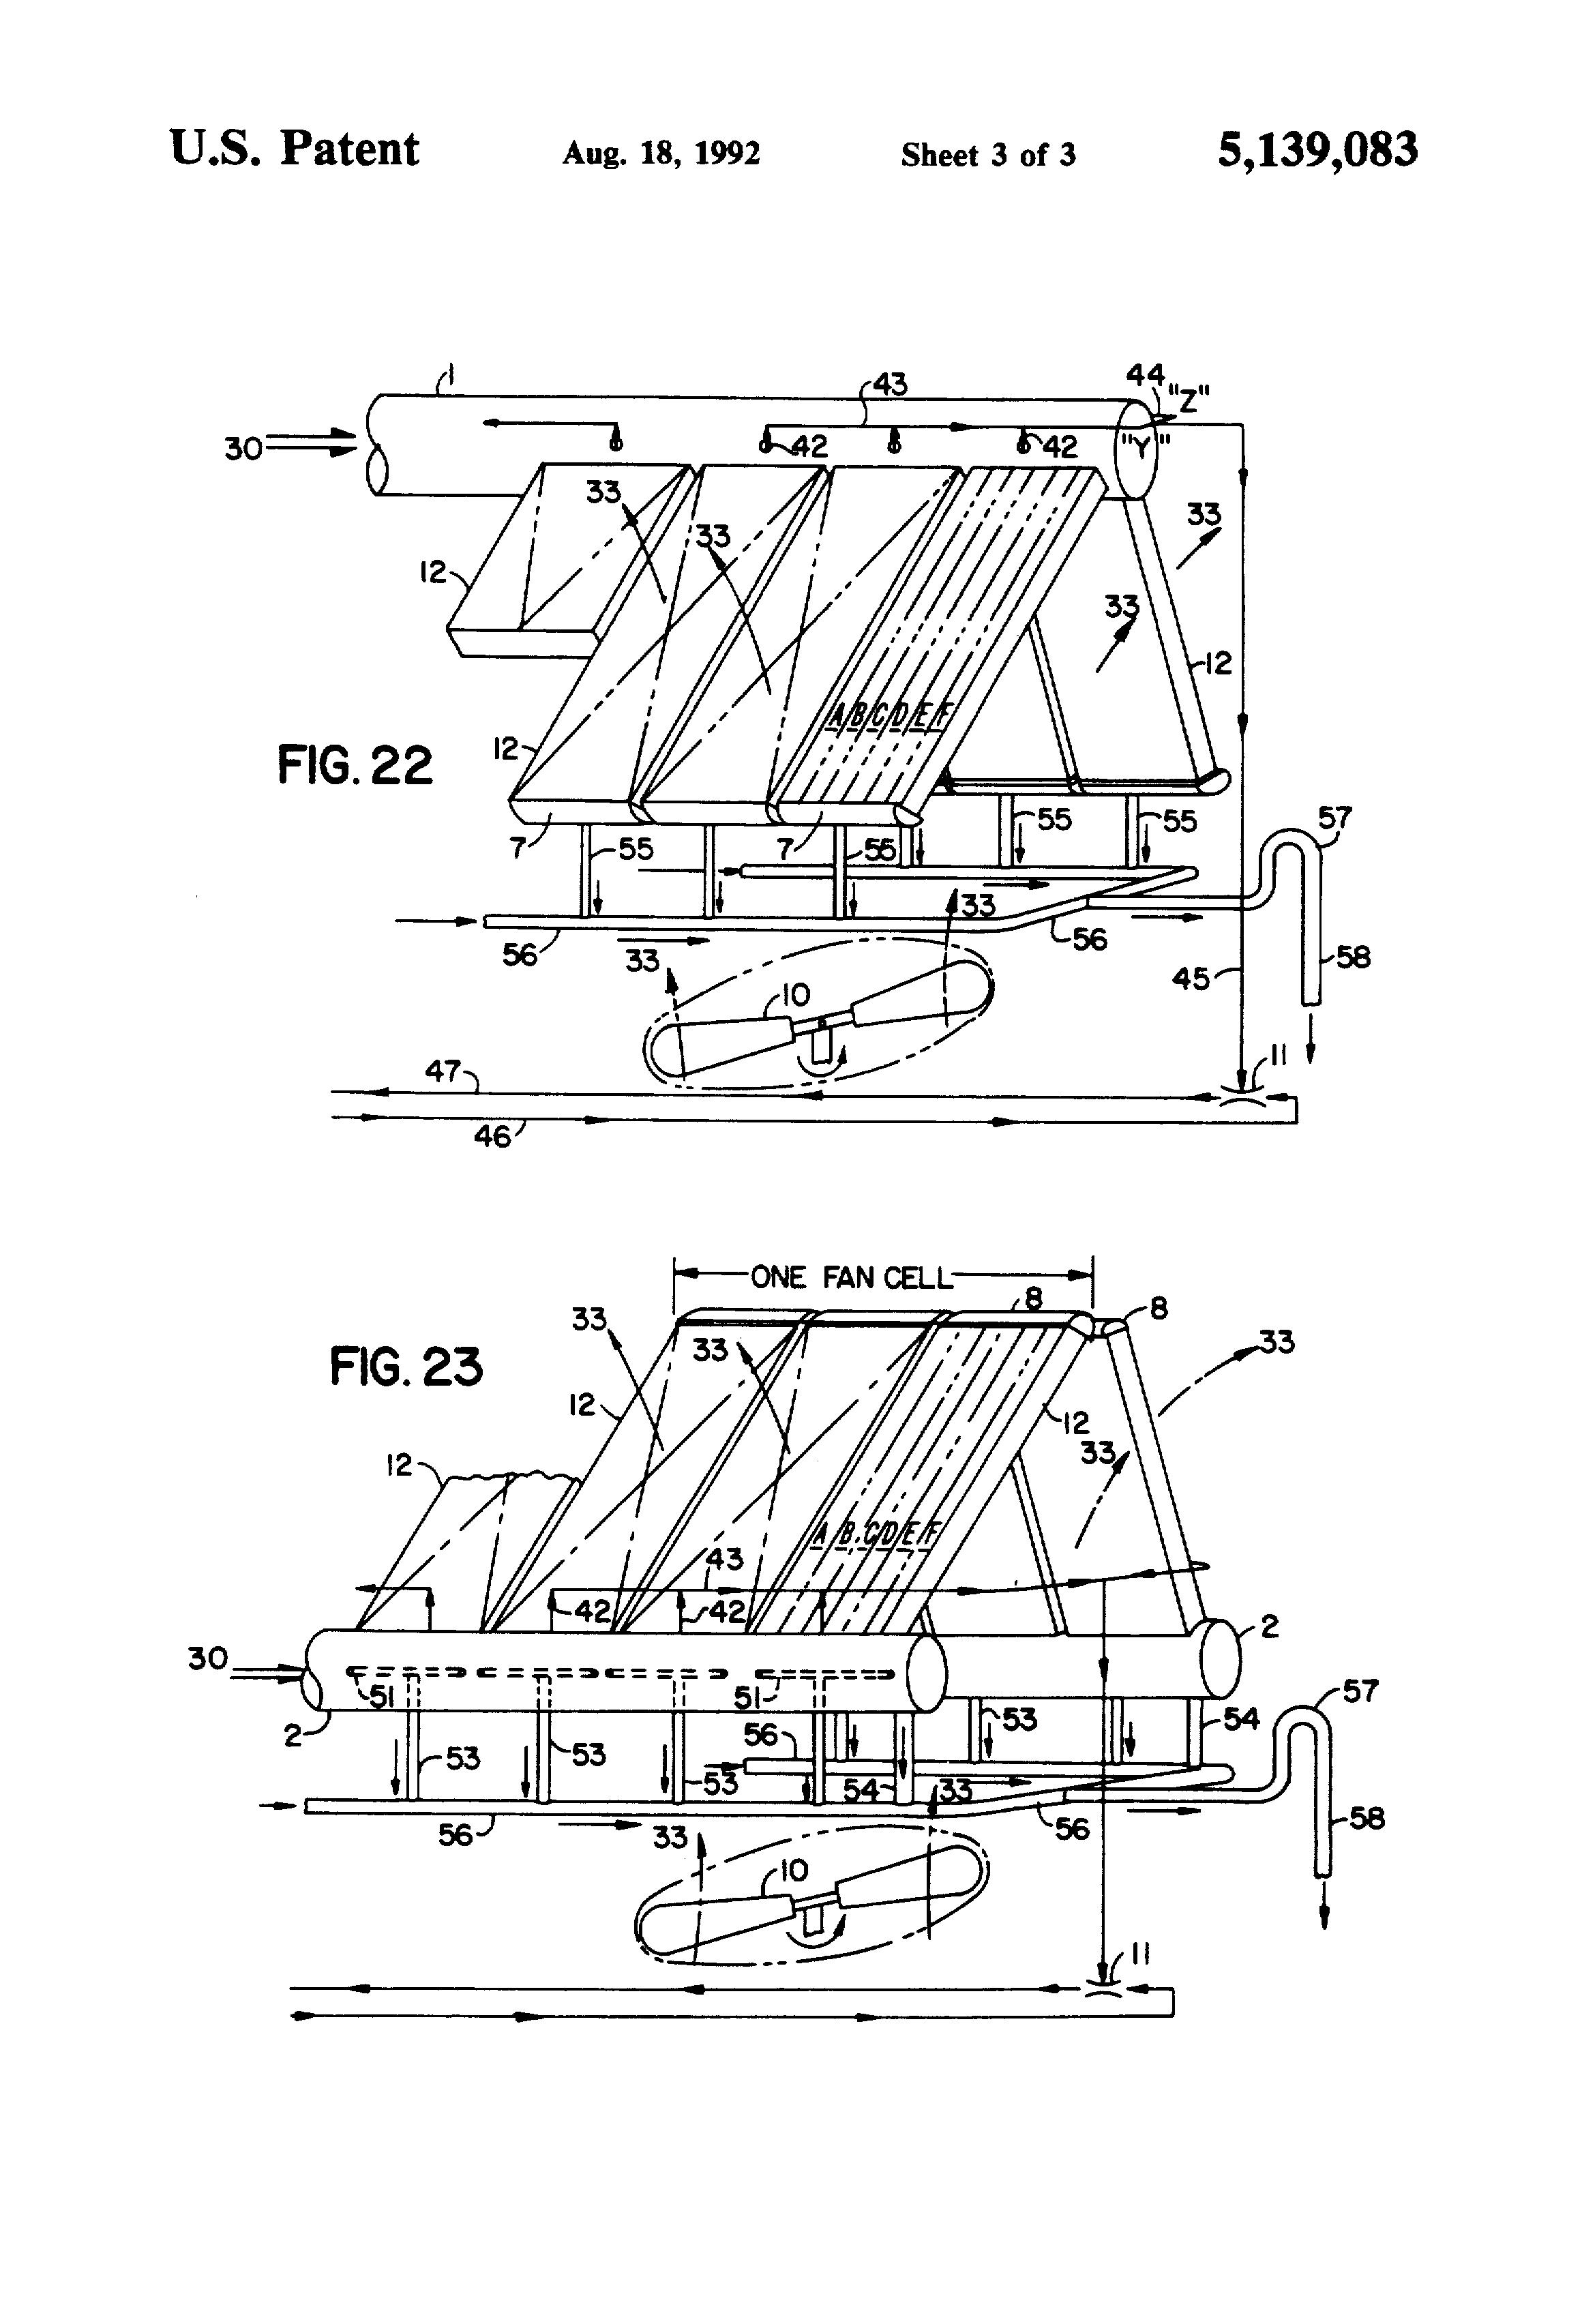 Patent US Air cooled vacuum steam condenser with flow